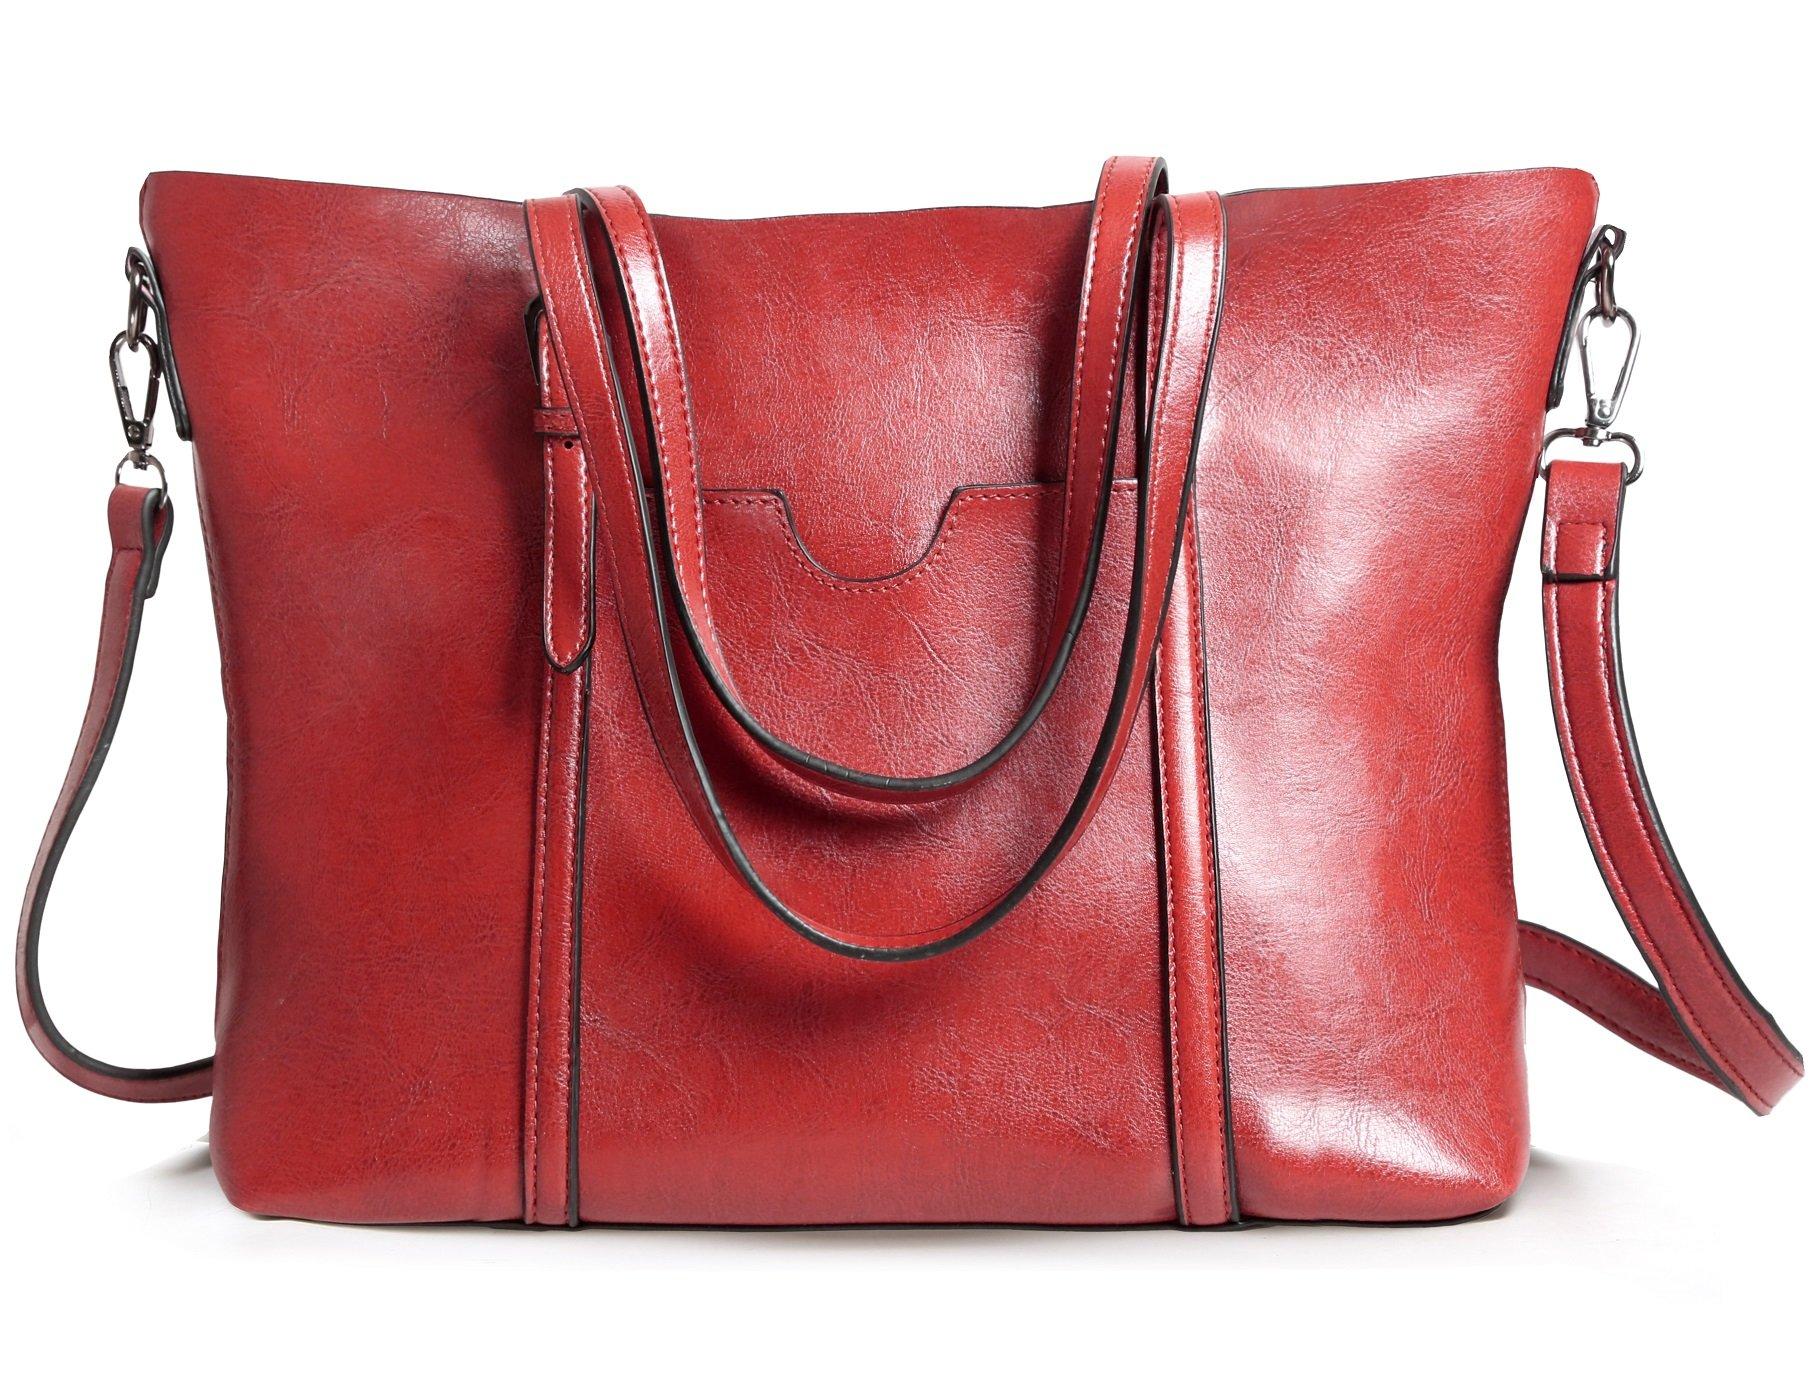 Womens Tote Bag Leather Handbag Top Handle Satchel Shoulder Bags Ladies Purse